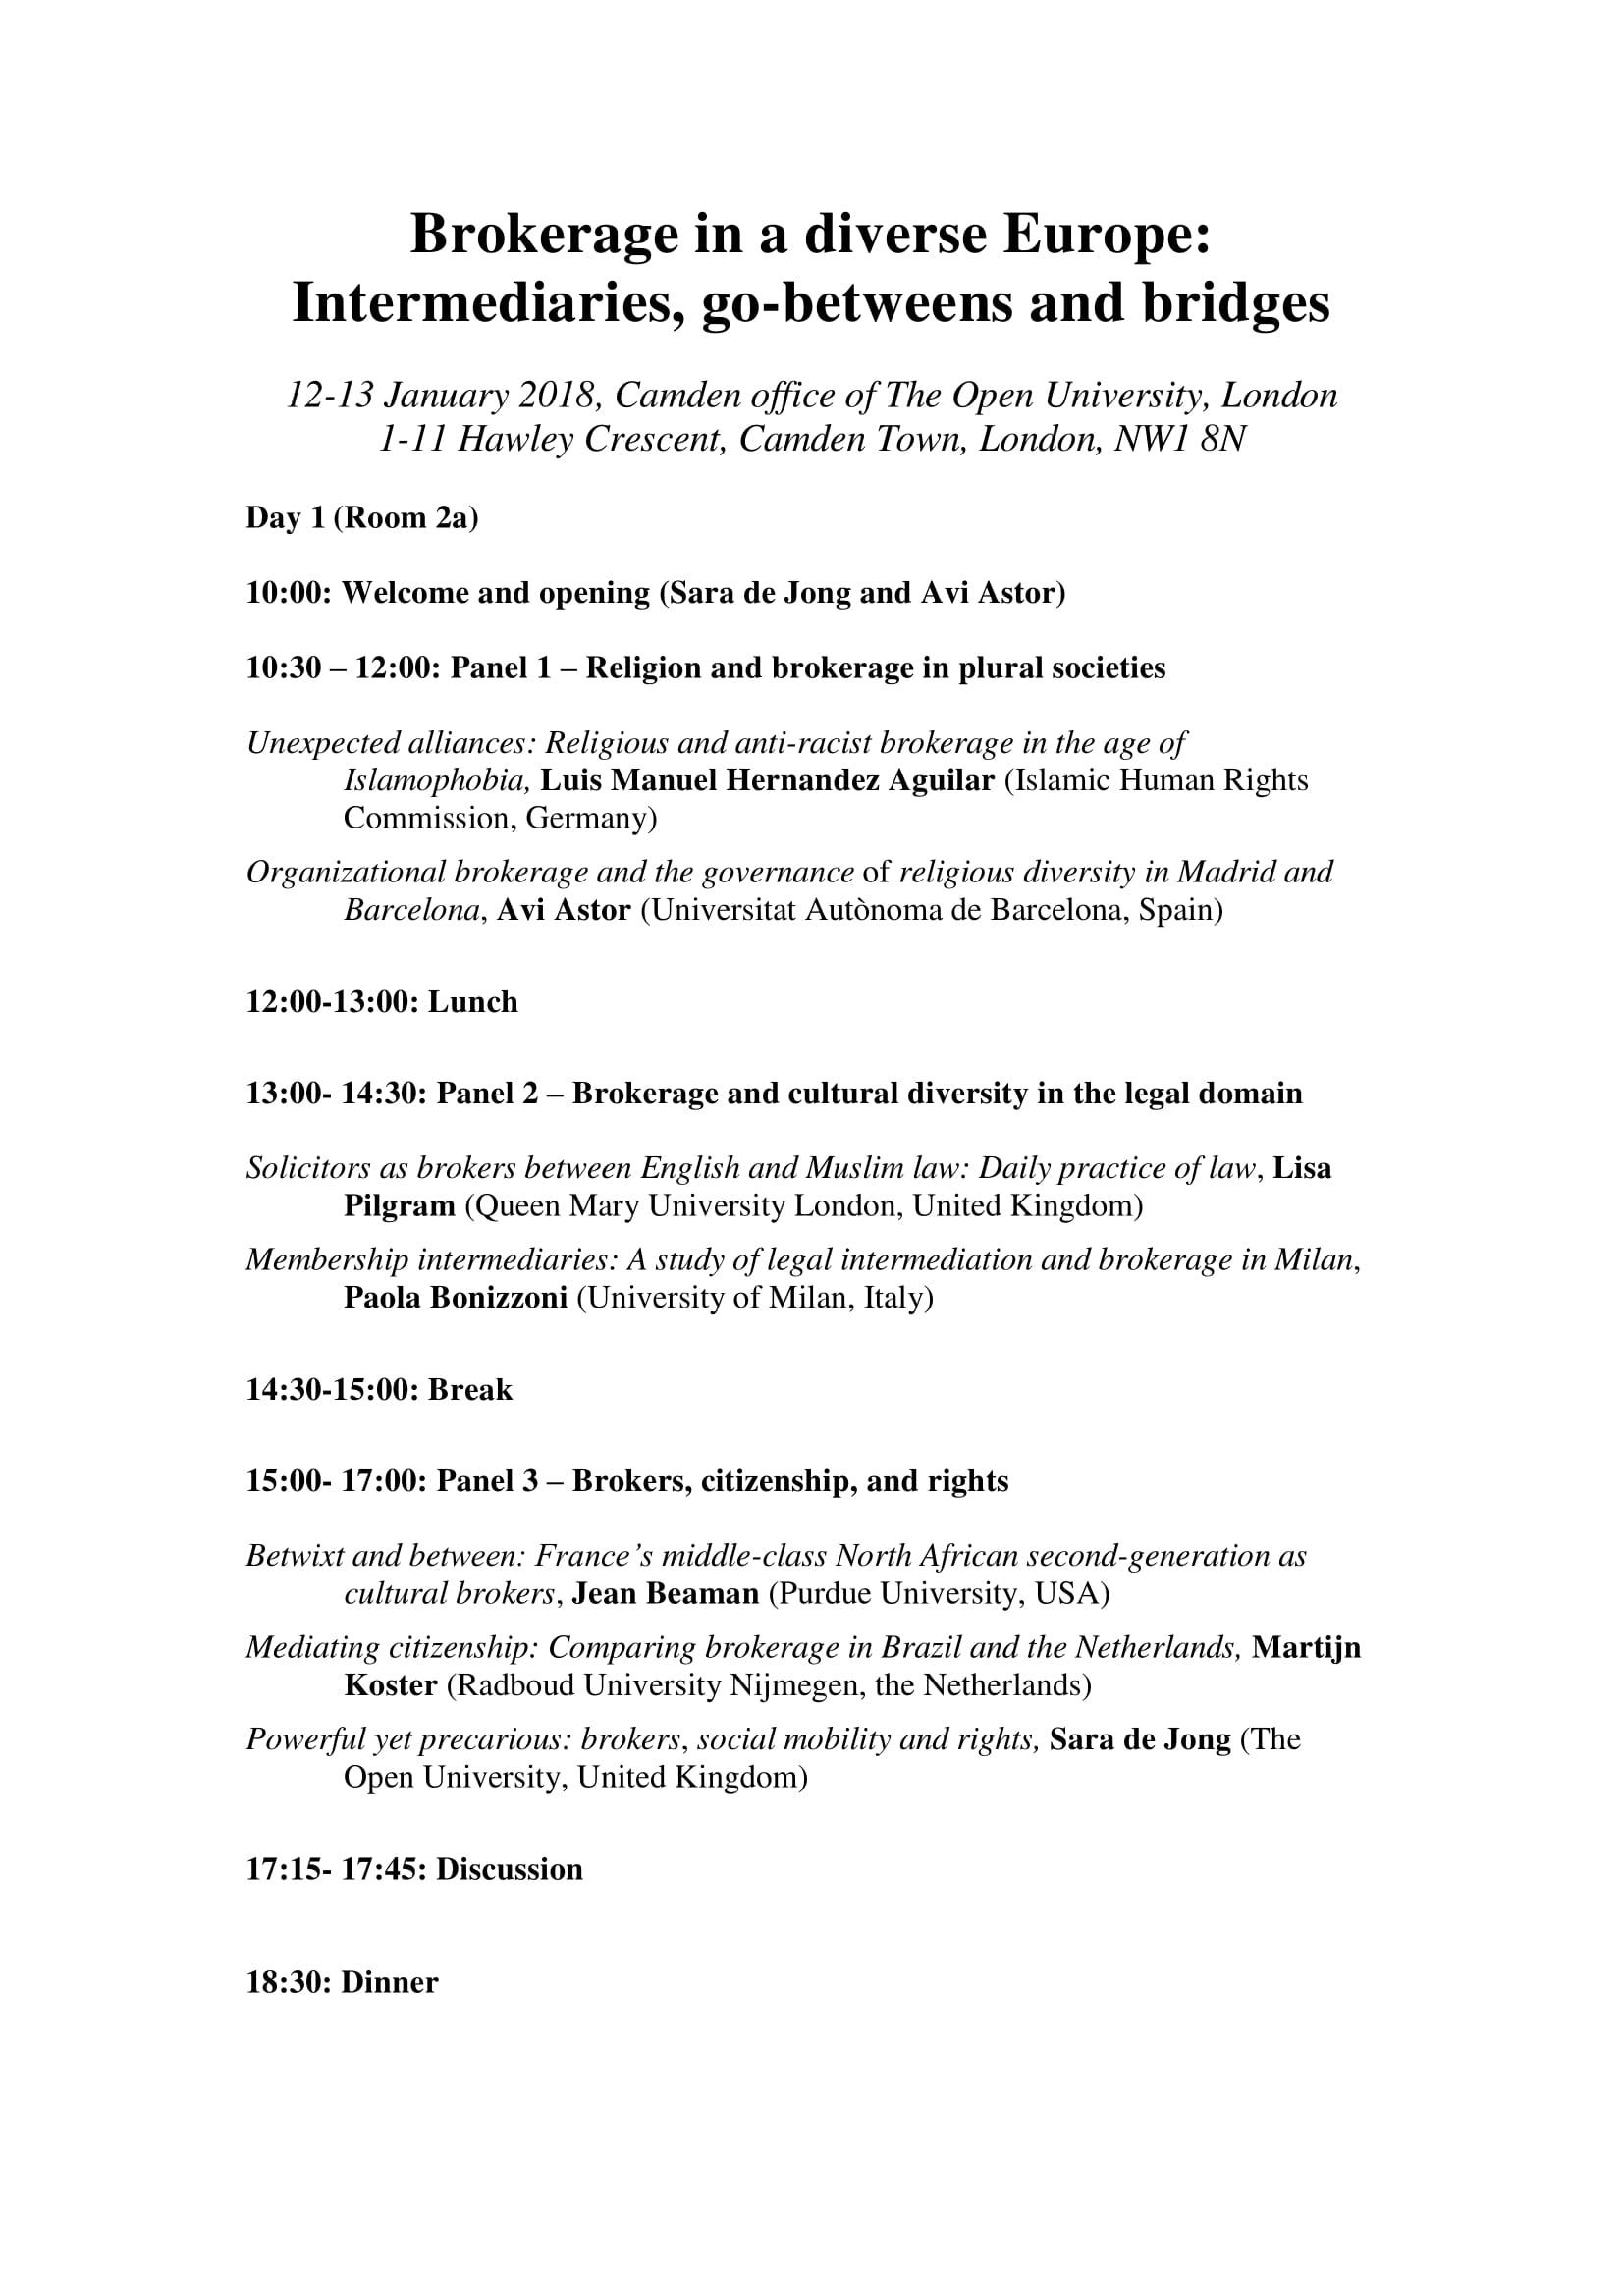 Final Programme London Workshop Brokerage (1)-1.jpg